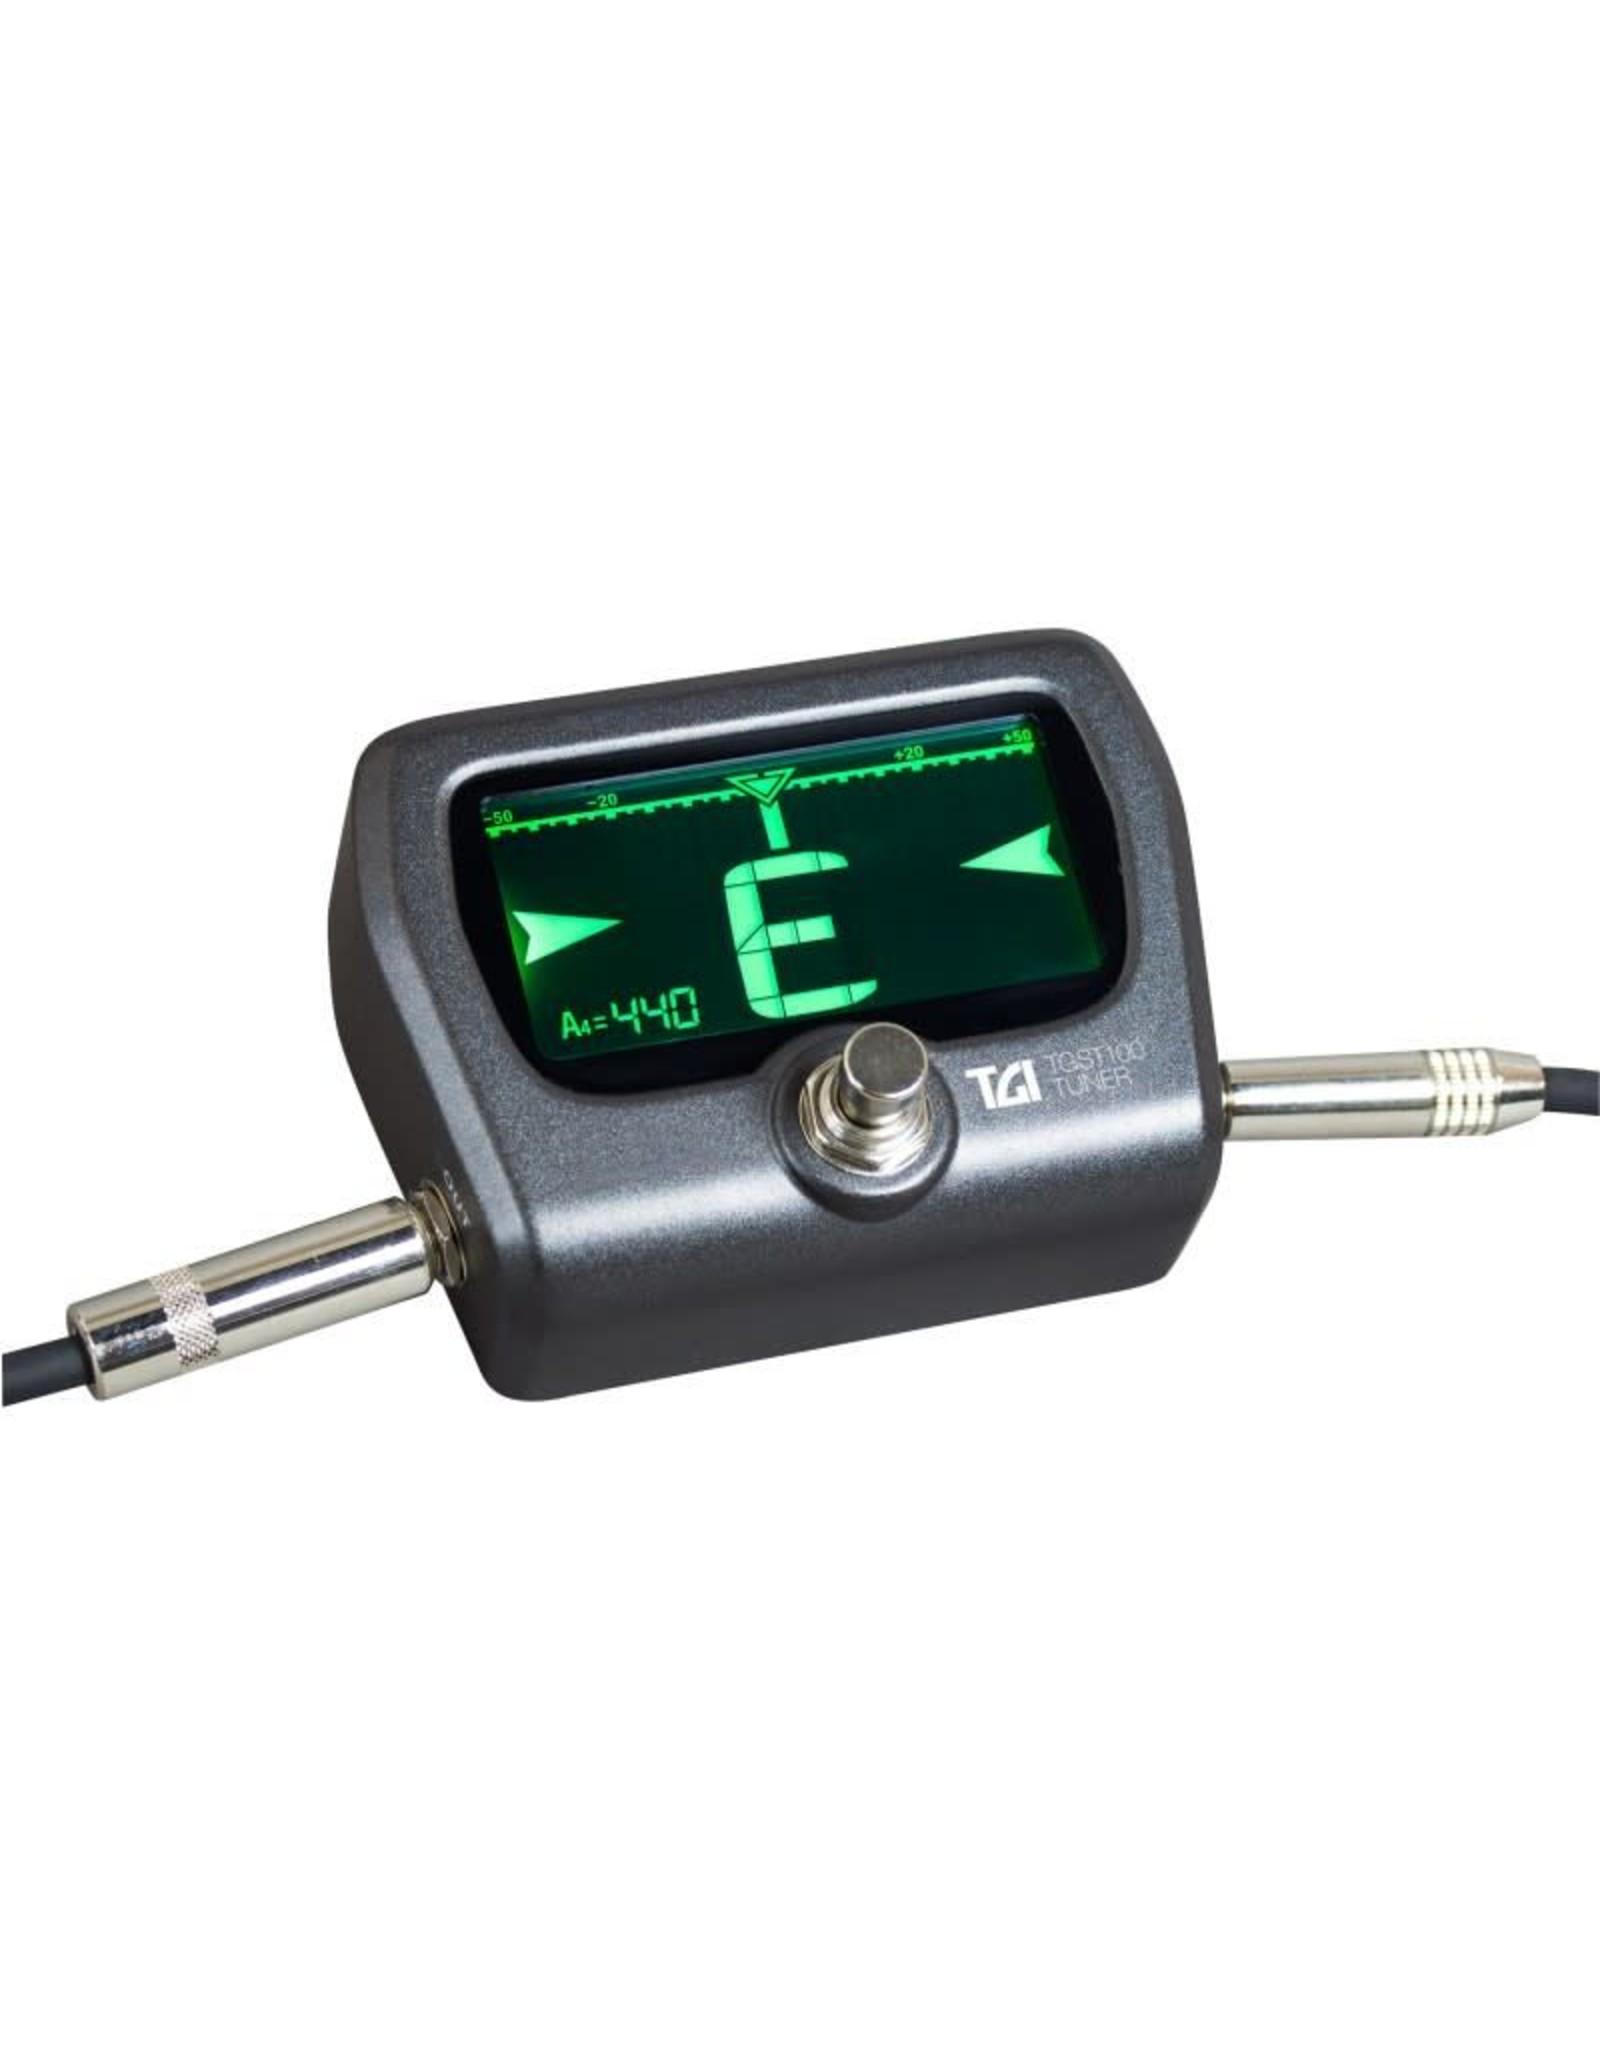 TGI Stage Tuner, Pedal Tuner, TGST100